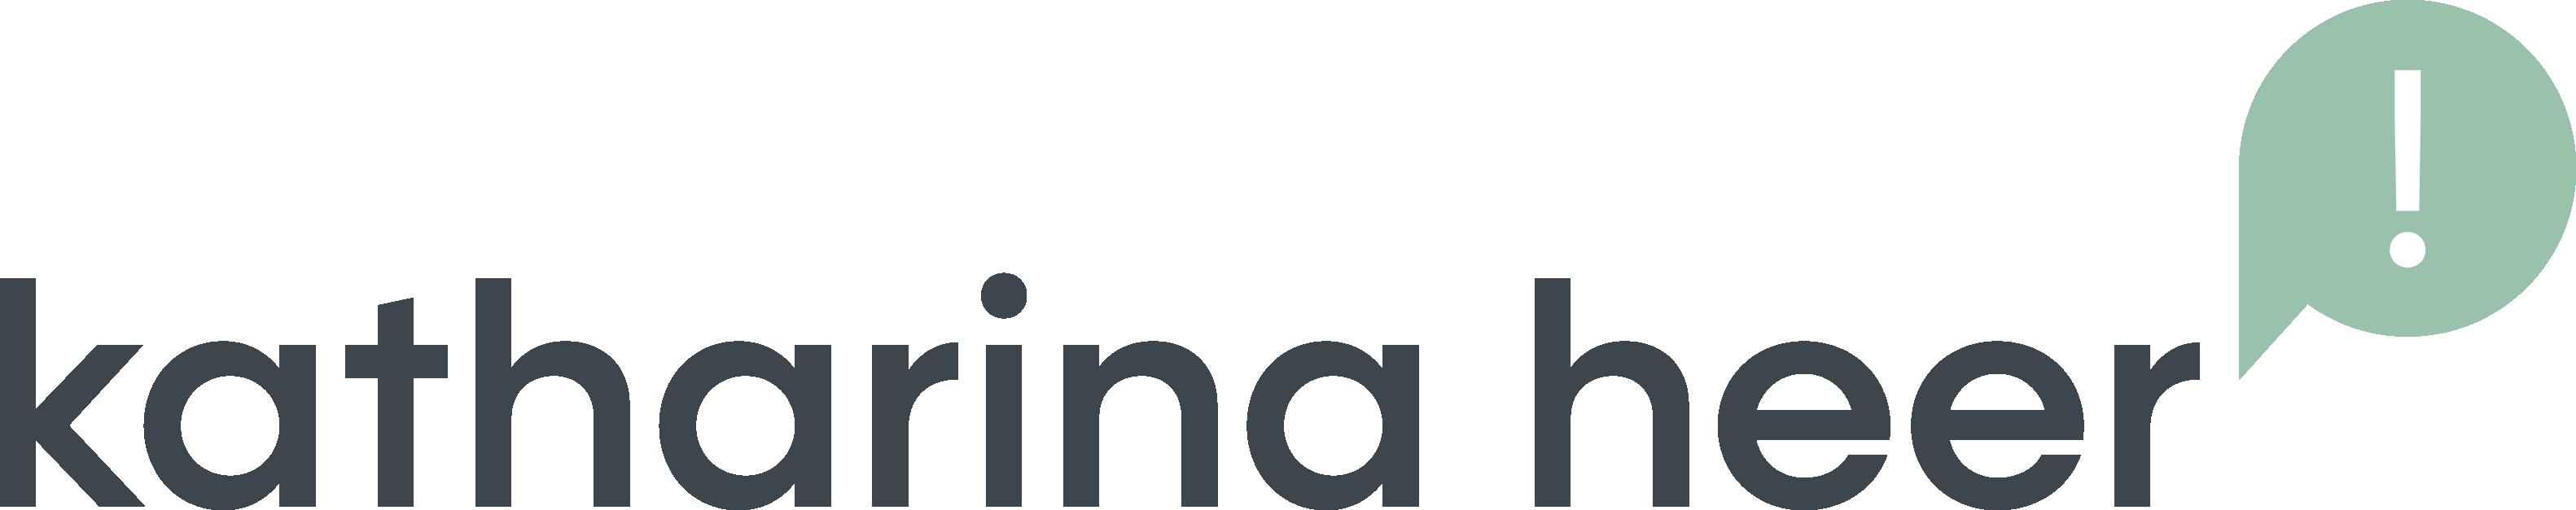 logo katharina heer büro für visuelle kommunikation